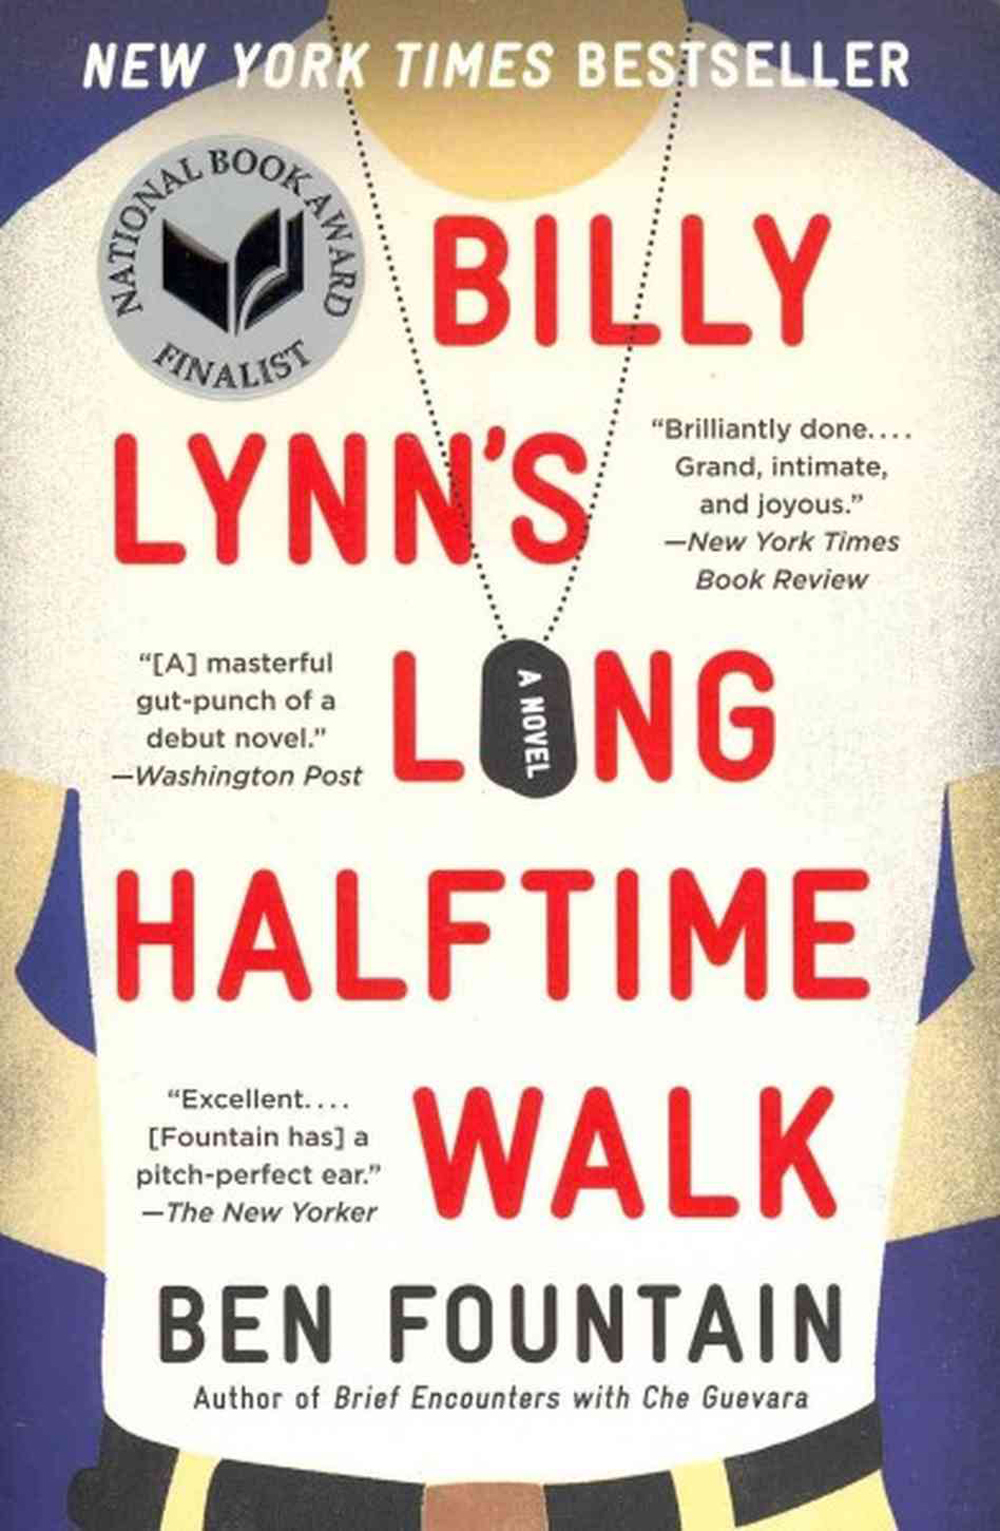 billy-lynns-cover-art